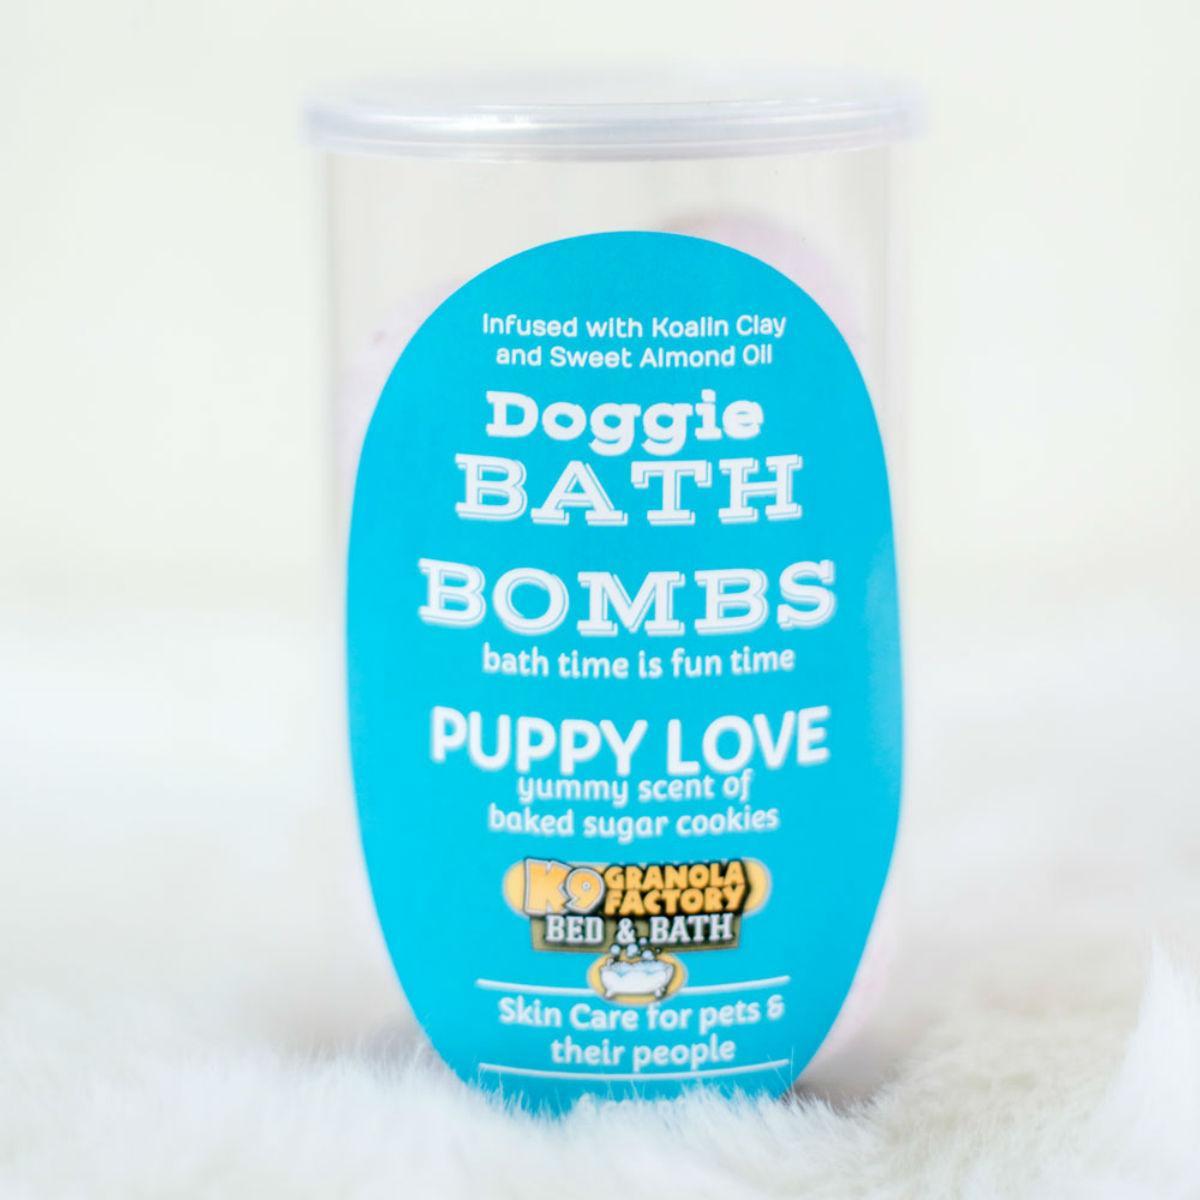 K9 Granola Factory Puppy Love Dog Bath Bomb - 6 Pack